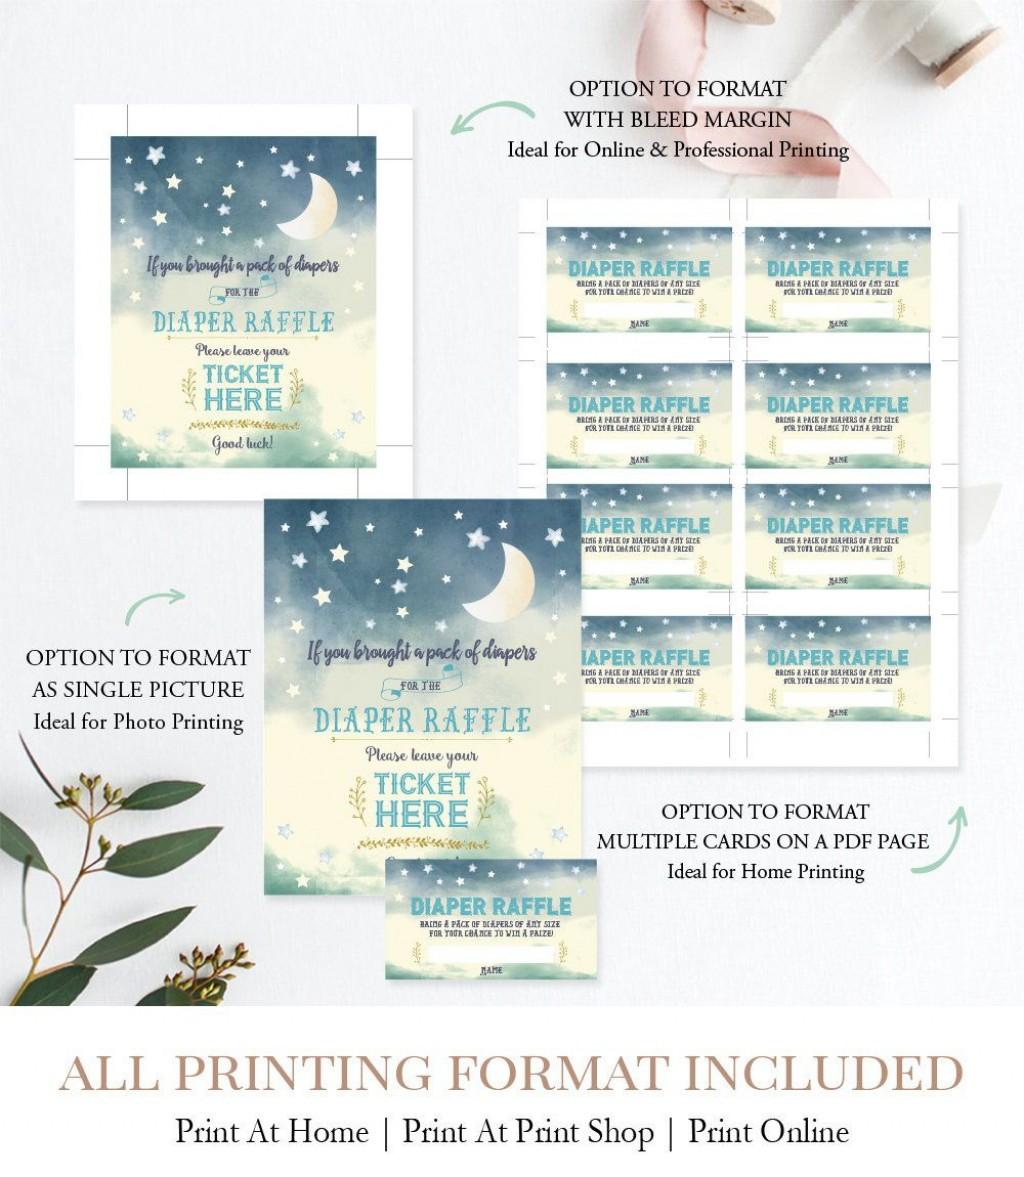 008 Beautiful Diaper Raffle Ticket Template Picture  Free Printable DownloadLarge